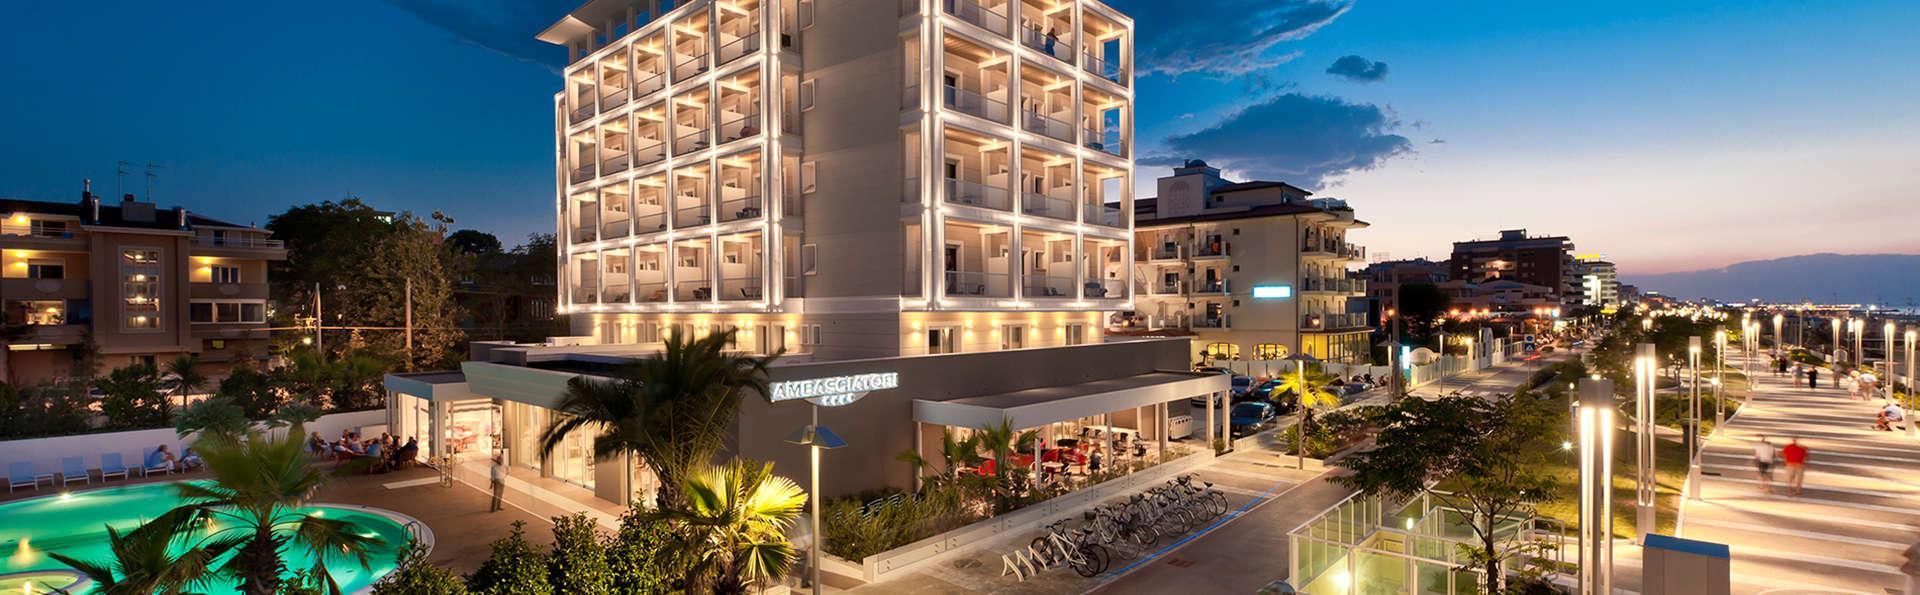 Hotel Ambasciatori - Edit_front2.jpg